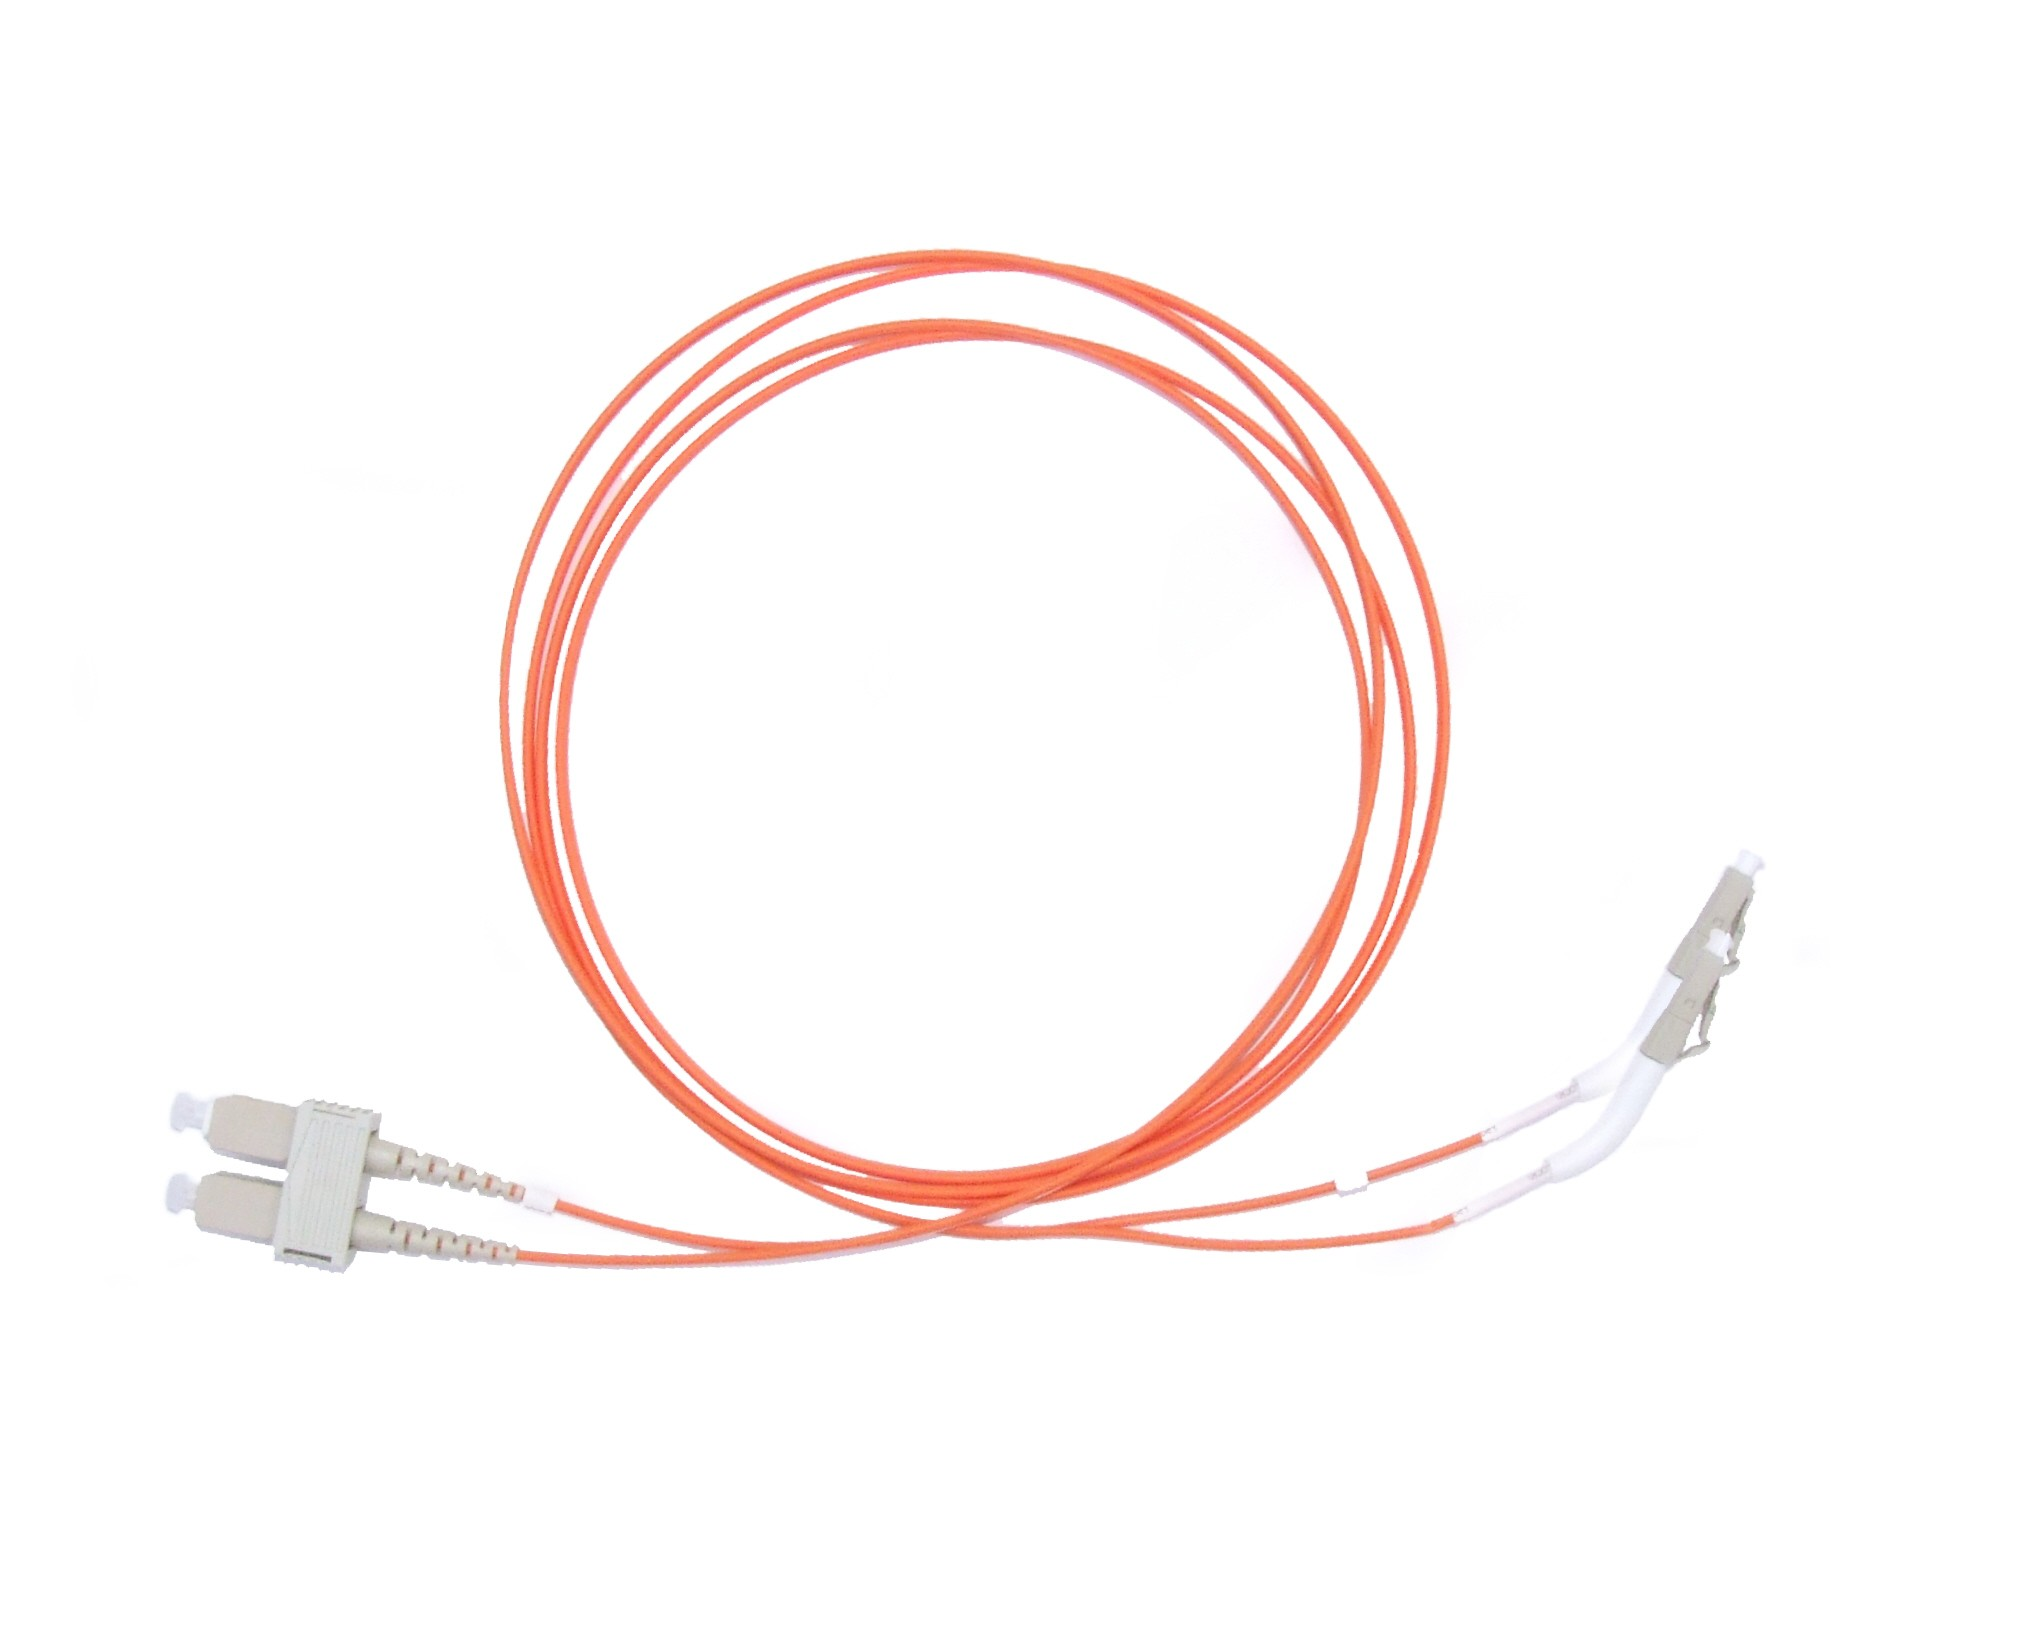 LC 45 deg boot - SC Multimode fibre patch lead 62.5/125 OM1 Duplex 3m